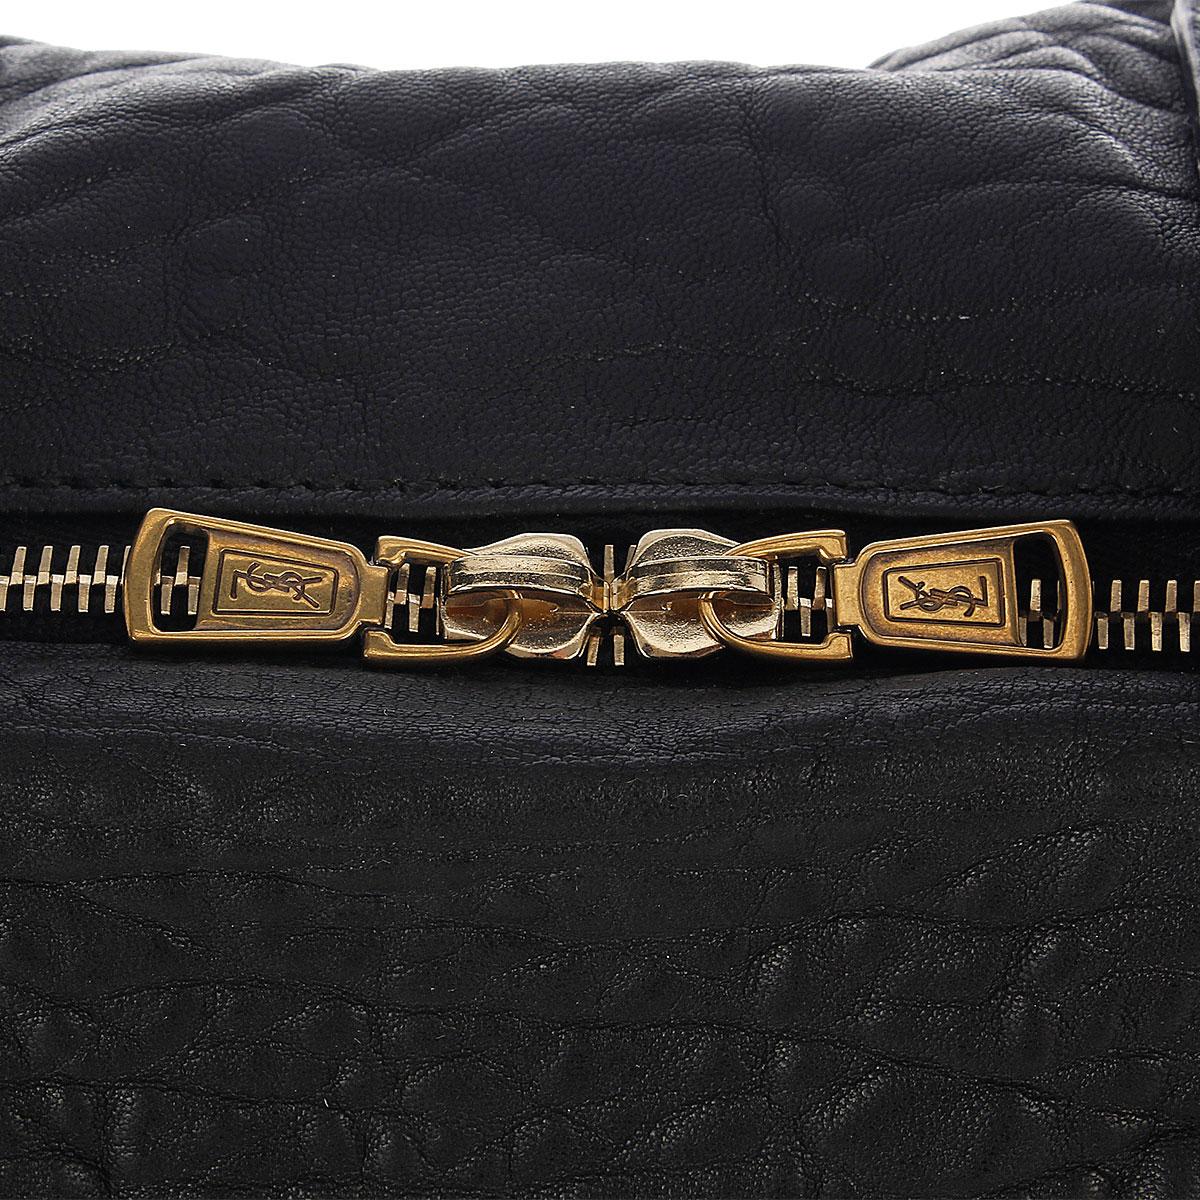 Yves Saint Laurent Women Leather SAC EASY Bag - Spence Outlet